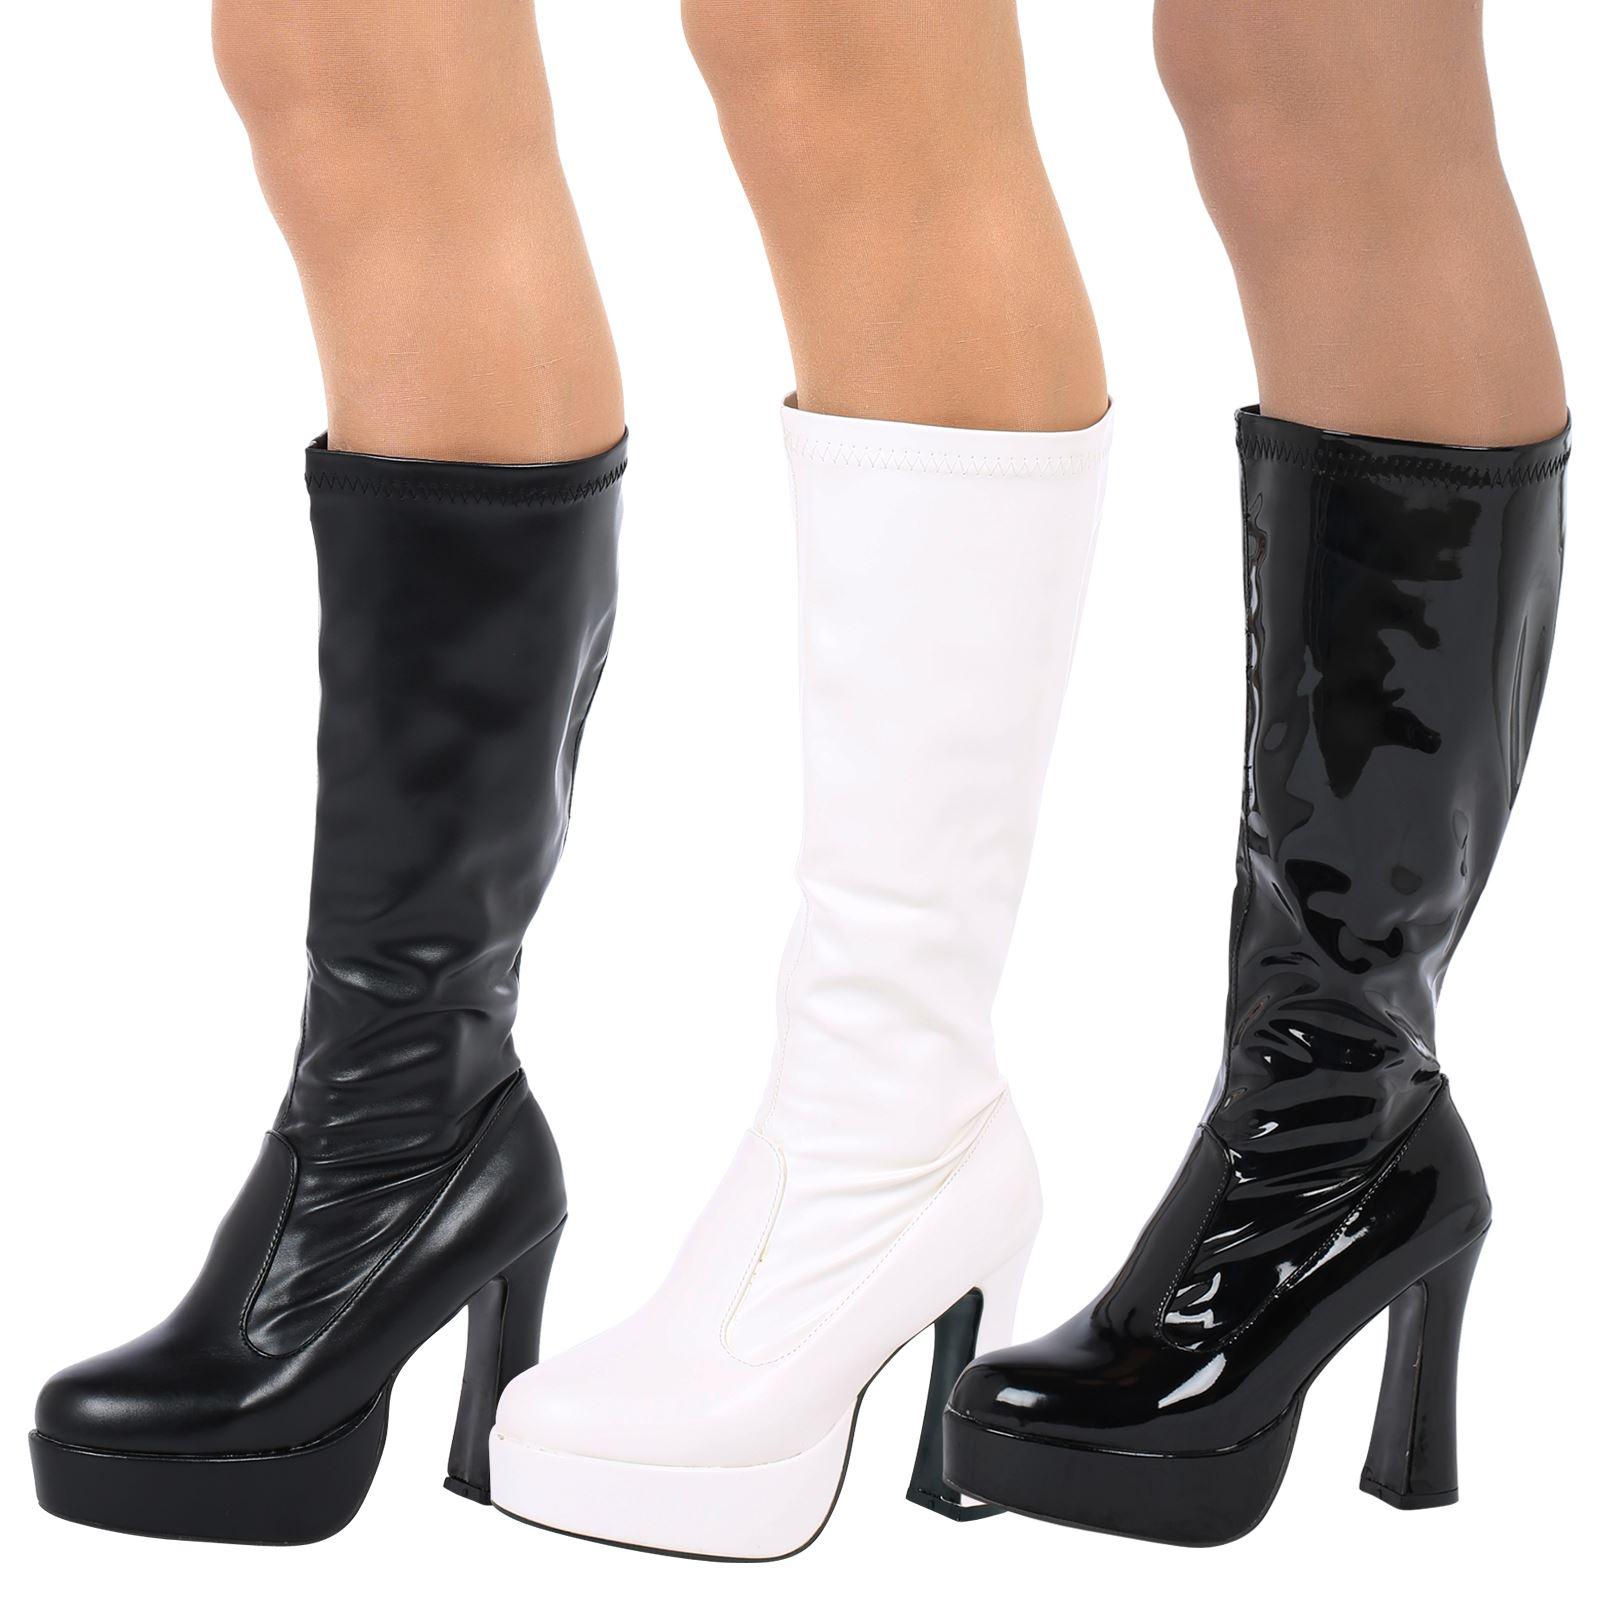 60ec67efcfe WOMENS LADIES FANCY DRESS 60s 70s PLATFORM RETRO GOGO BOOTS KNEE HIGH SHOES  NEW